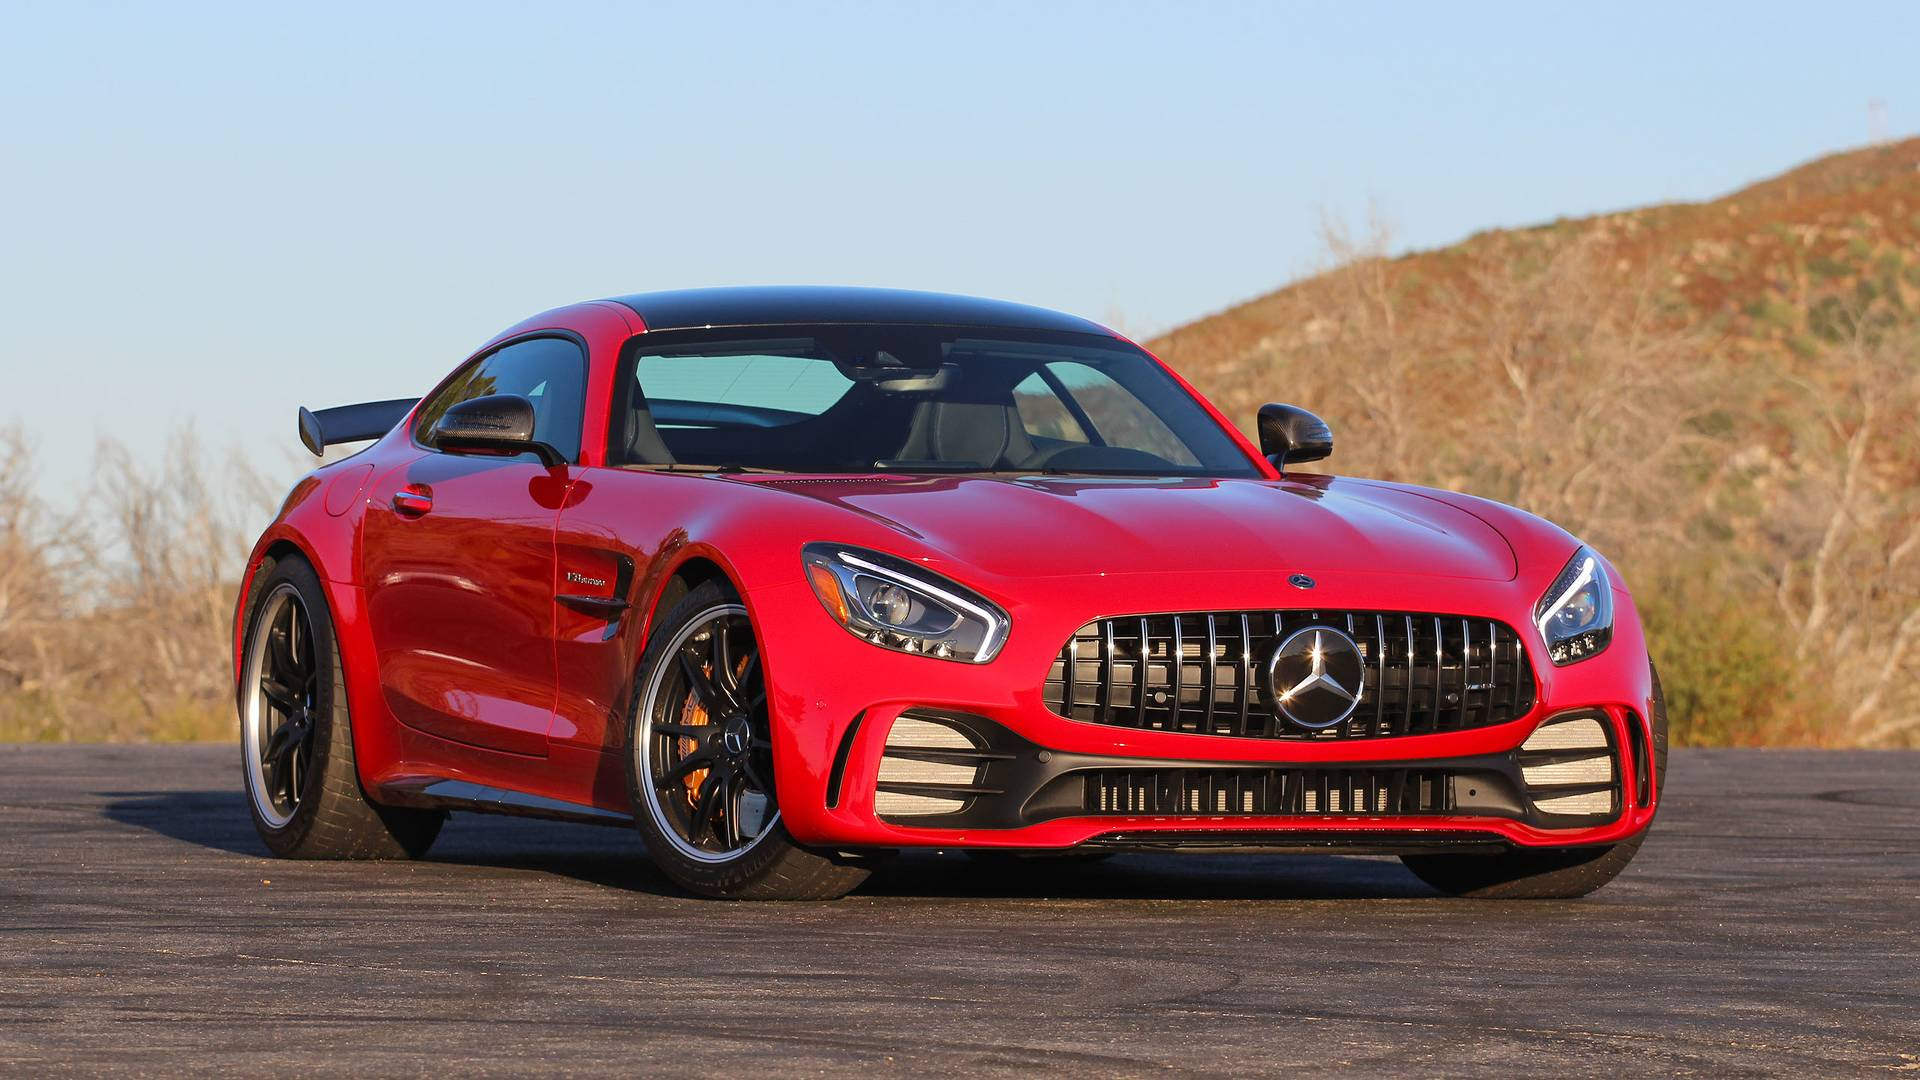 Mercedes Of Fairfield >> 2018 Amg Gt R Coupe | Motavera.com